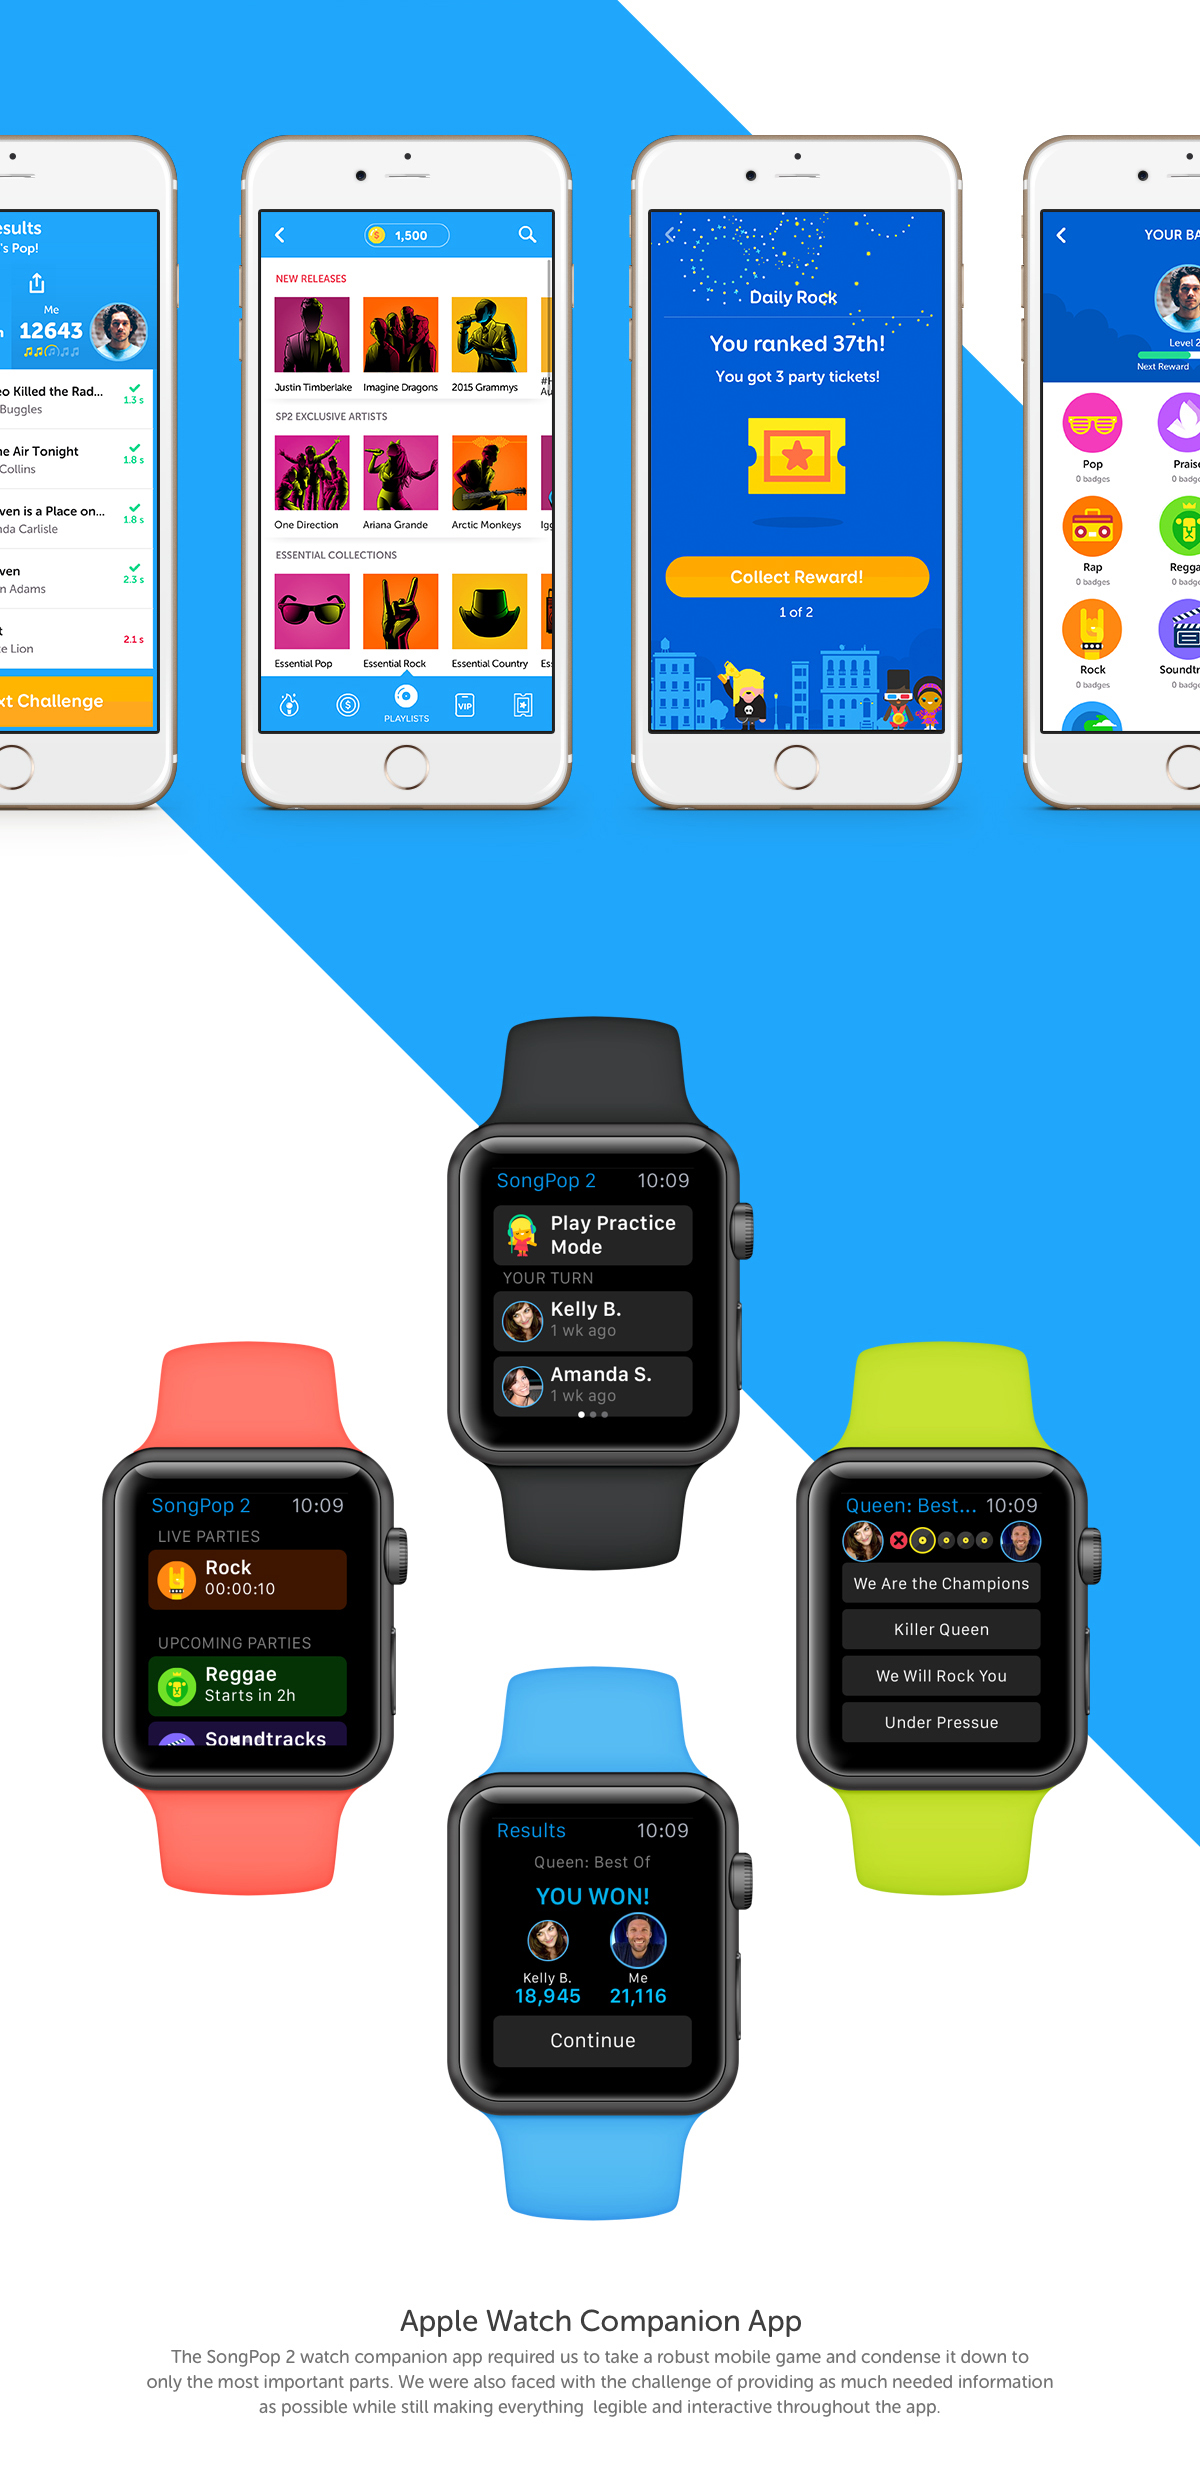 Mobile app songpop 2 mobile game ui design UI/UX visual design interaction